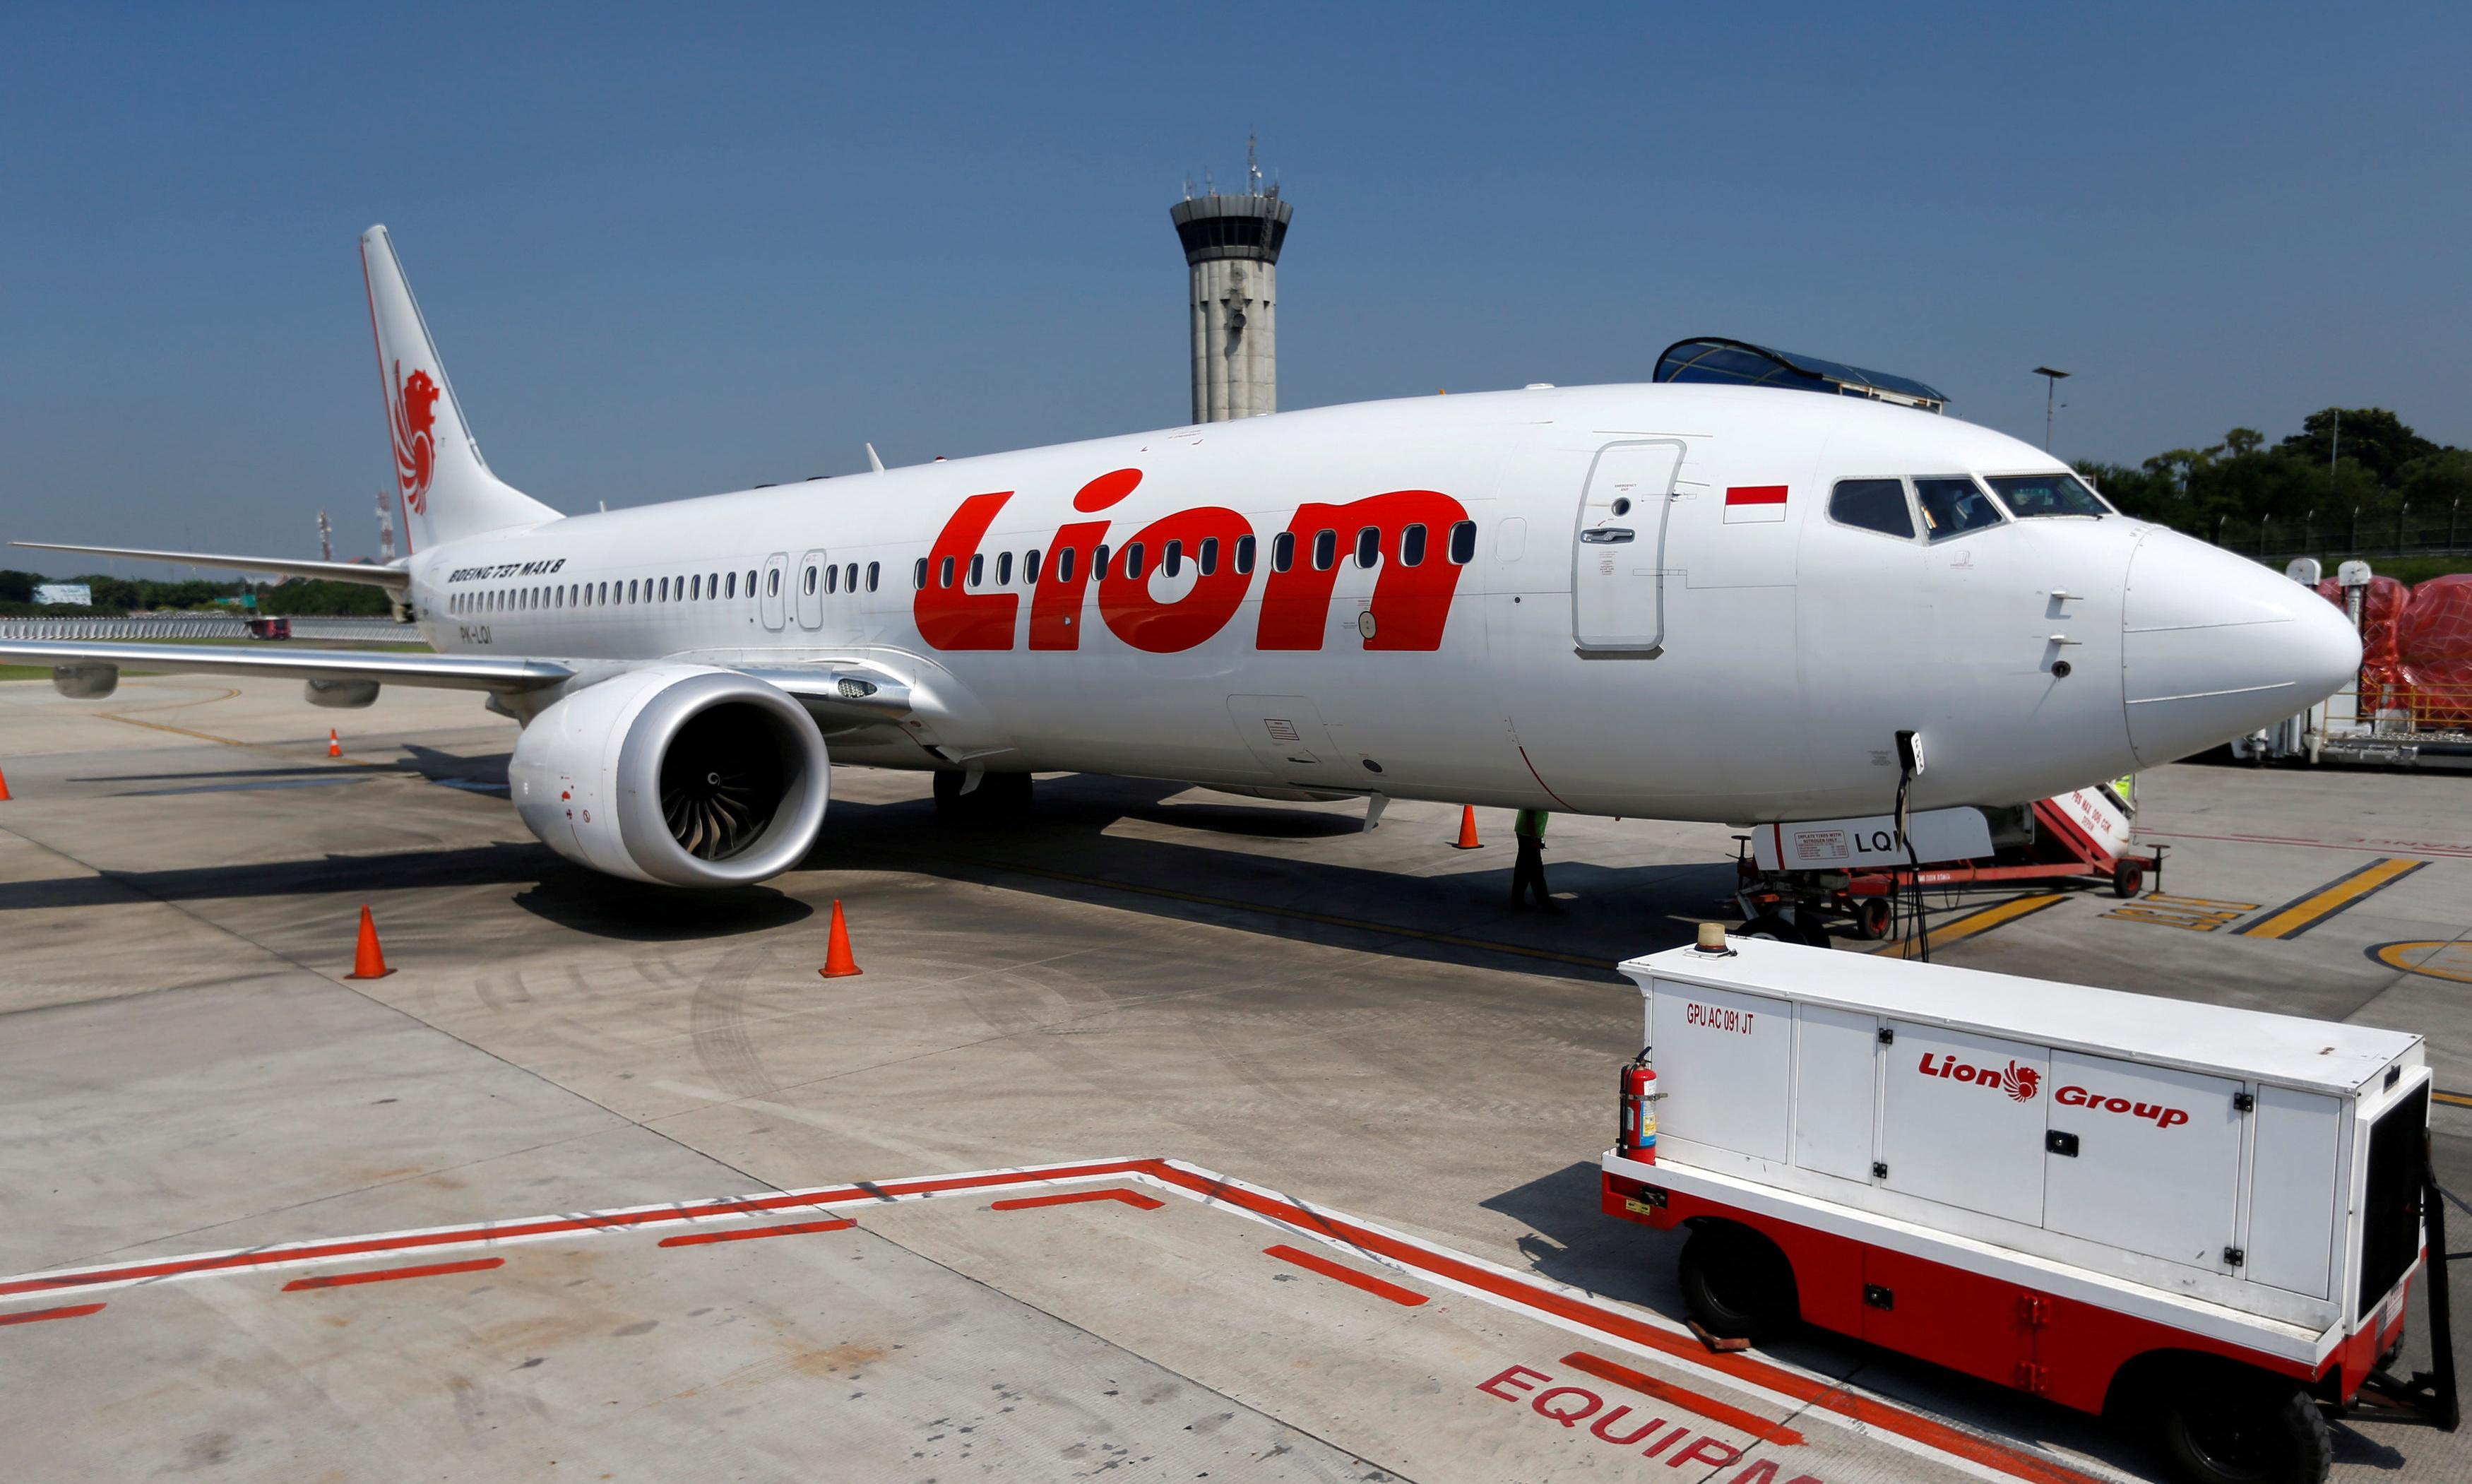 Lion Air pilots were looking at handbook when plane crashed